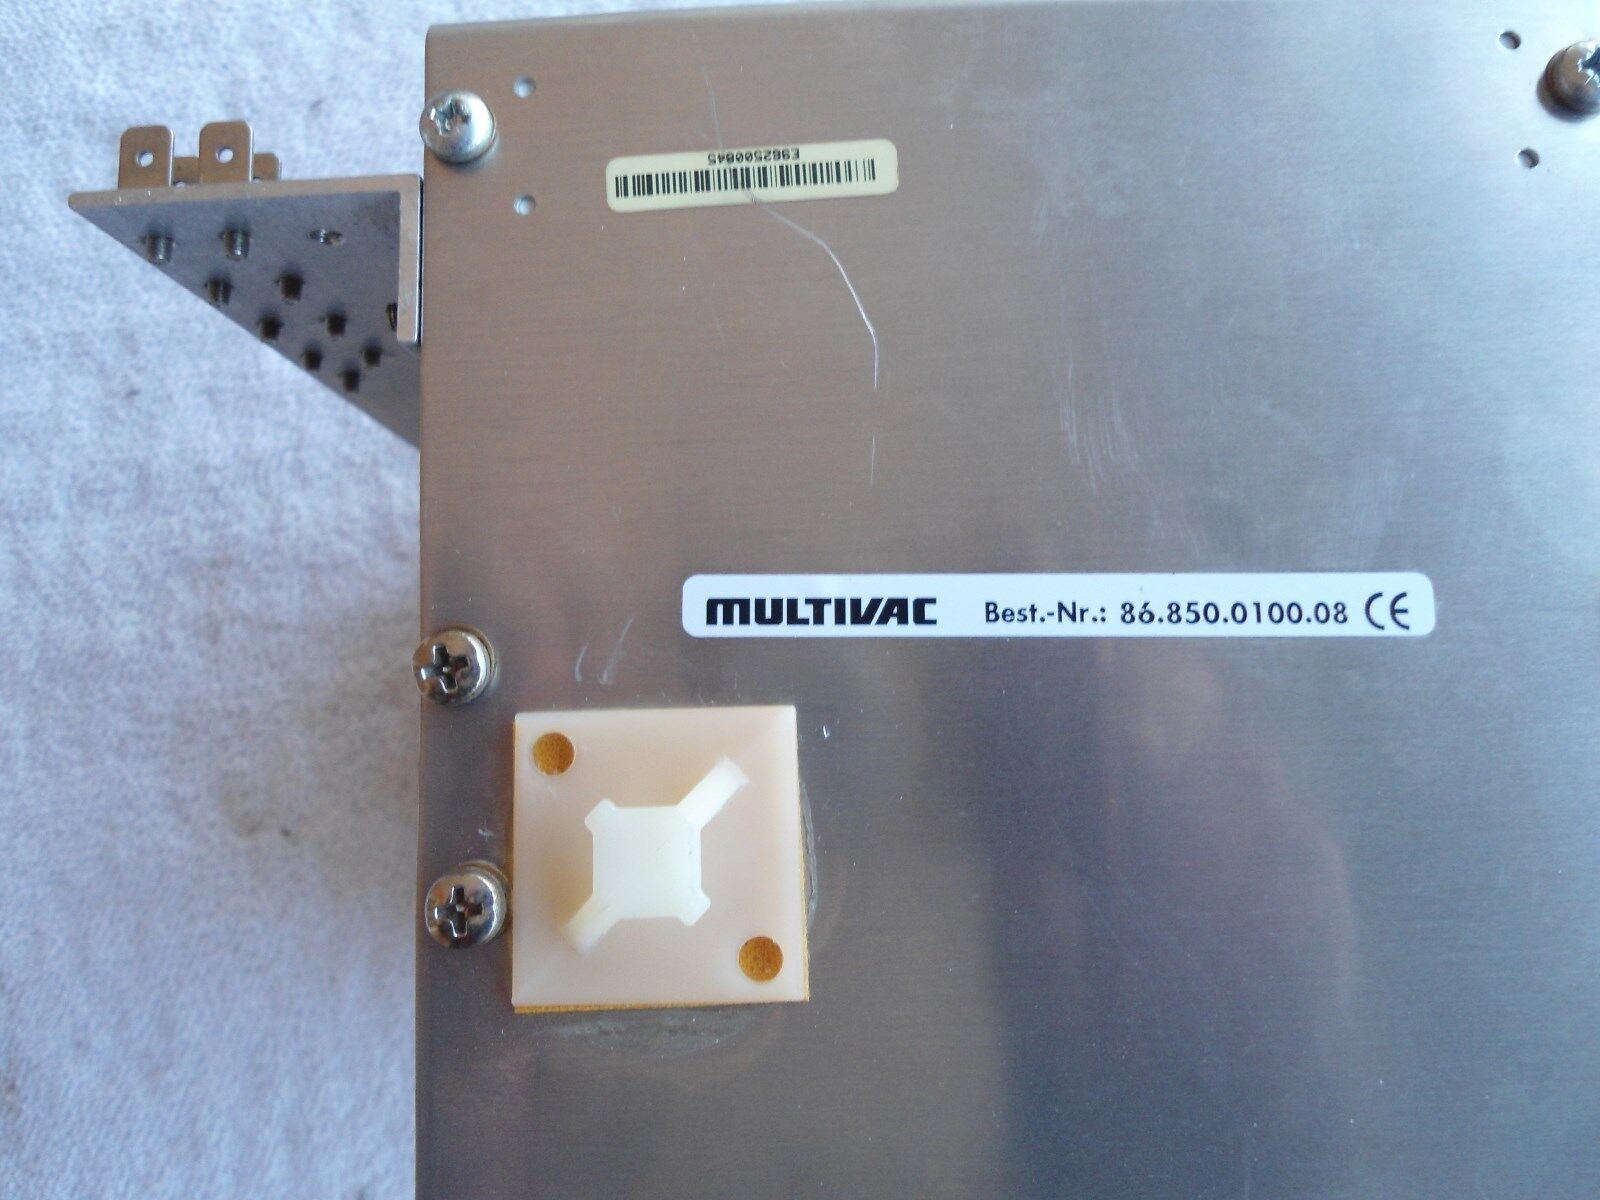 MULTIVAC 10 Slot Rack      86.850.0100.08